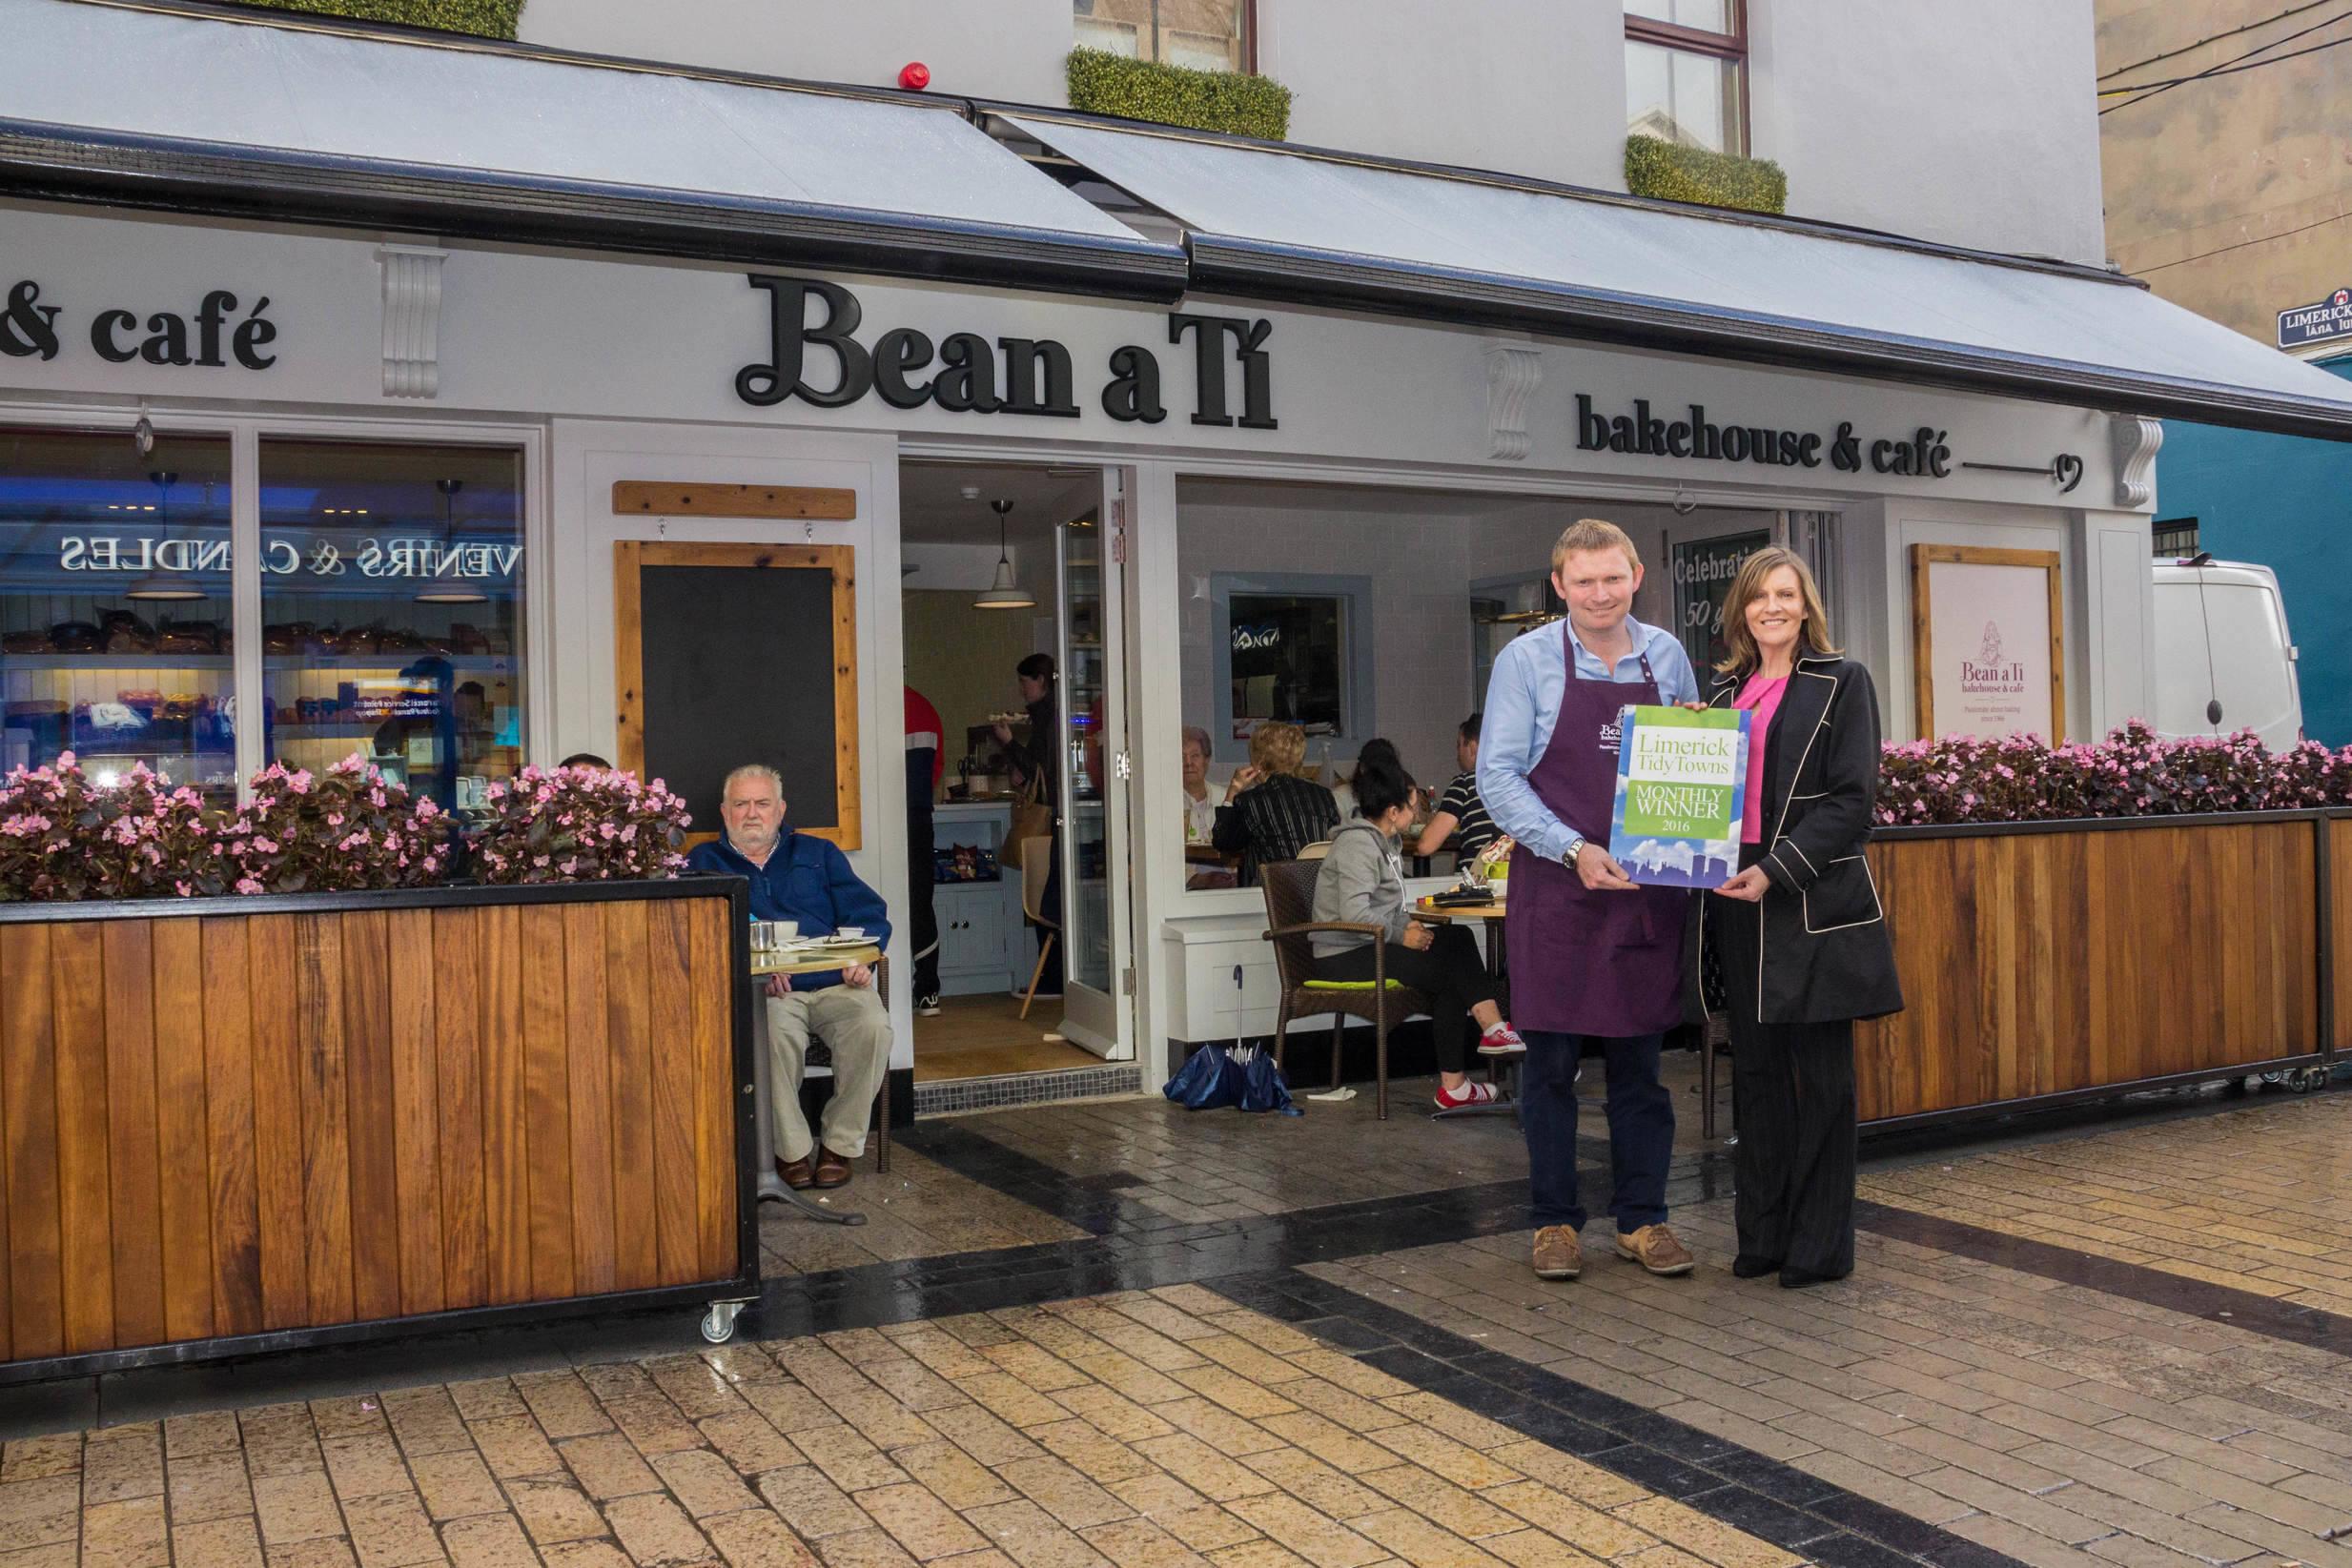 Limerick Tidy Towns Monthly Award September 2016